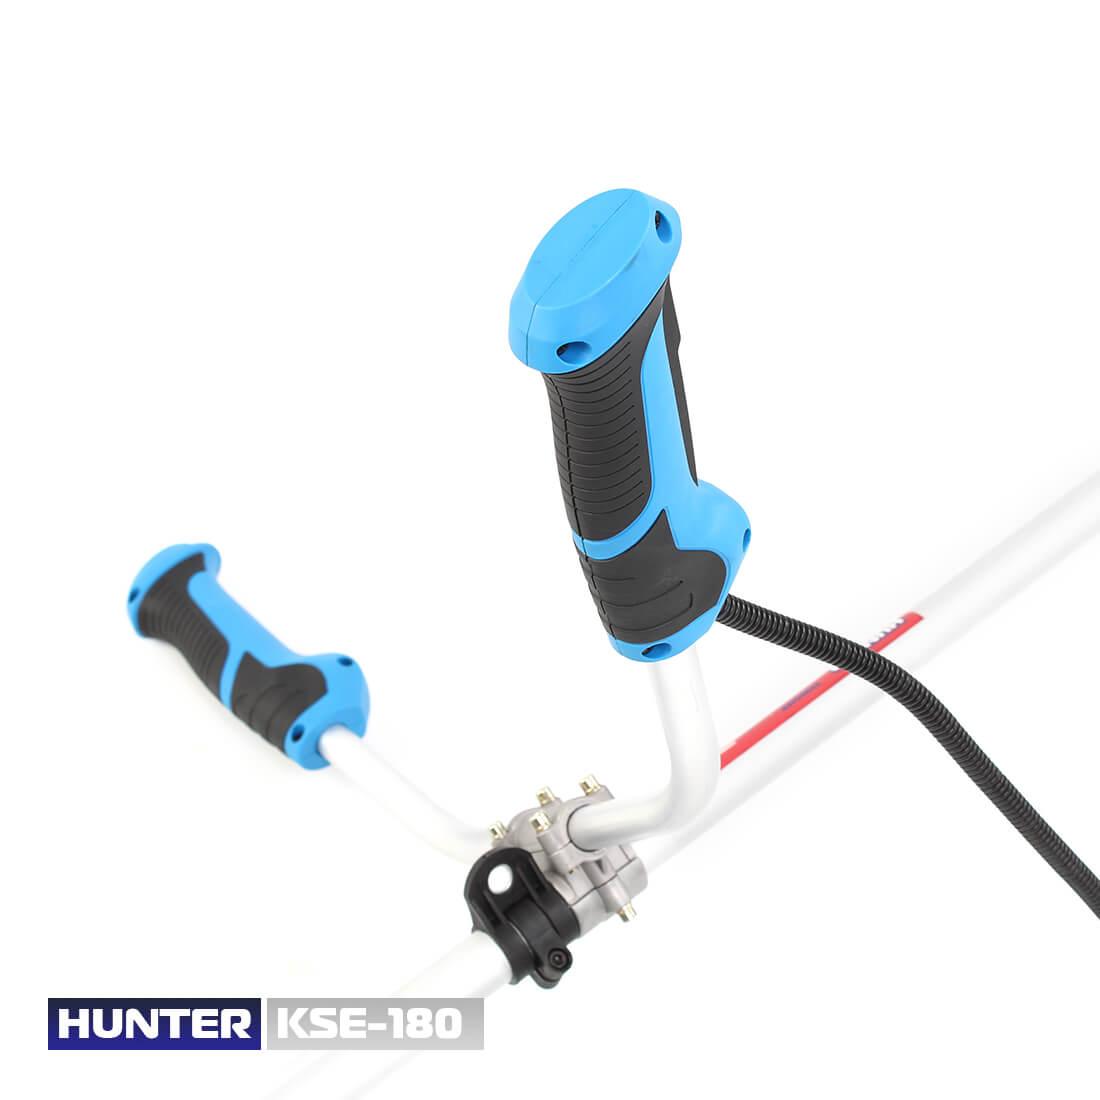 Фото Электрический триммер KSE-180 цена 2300грн №6 — Hunter